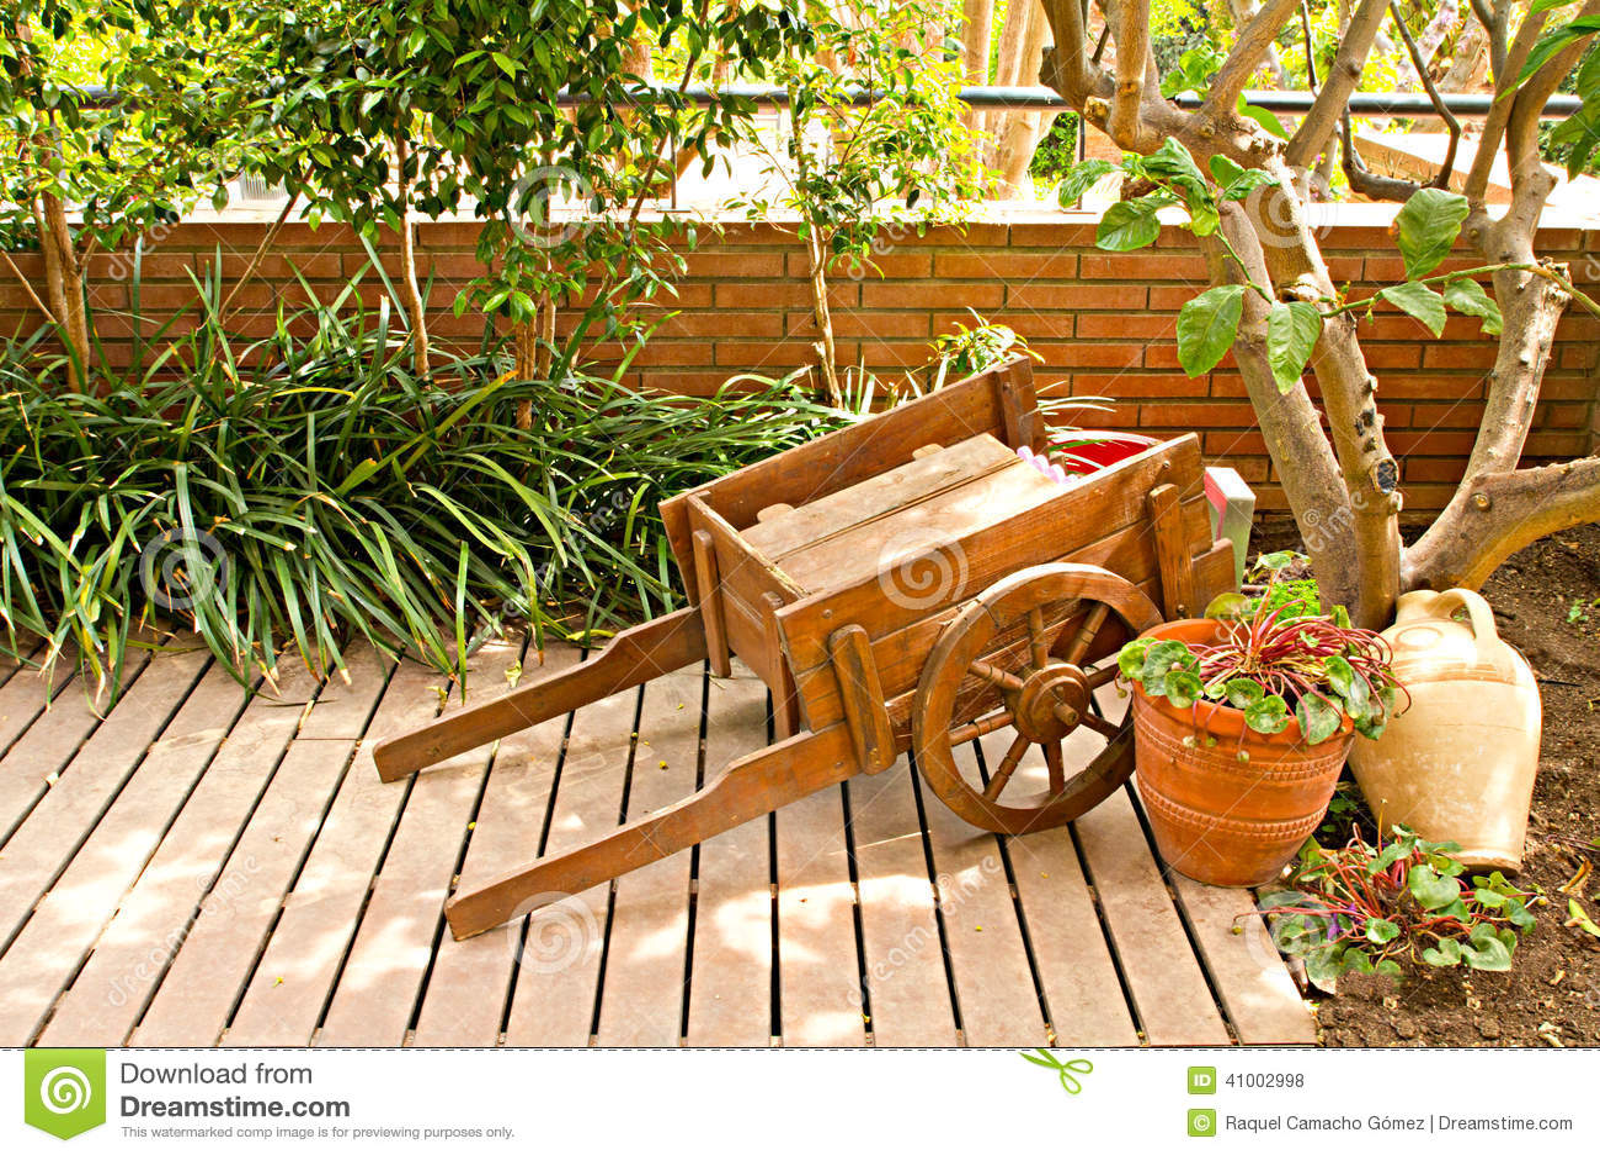 chariot de jardin en bois photo stock image du ferme 41002998. Black Bedroom Furniture Sets. Home Design Ideas